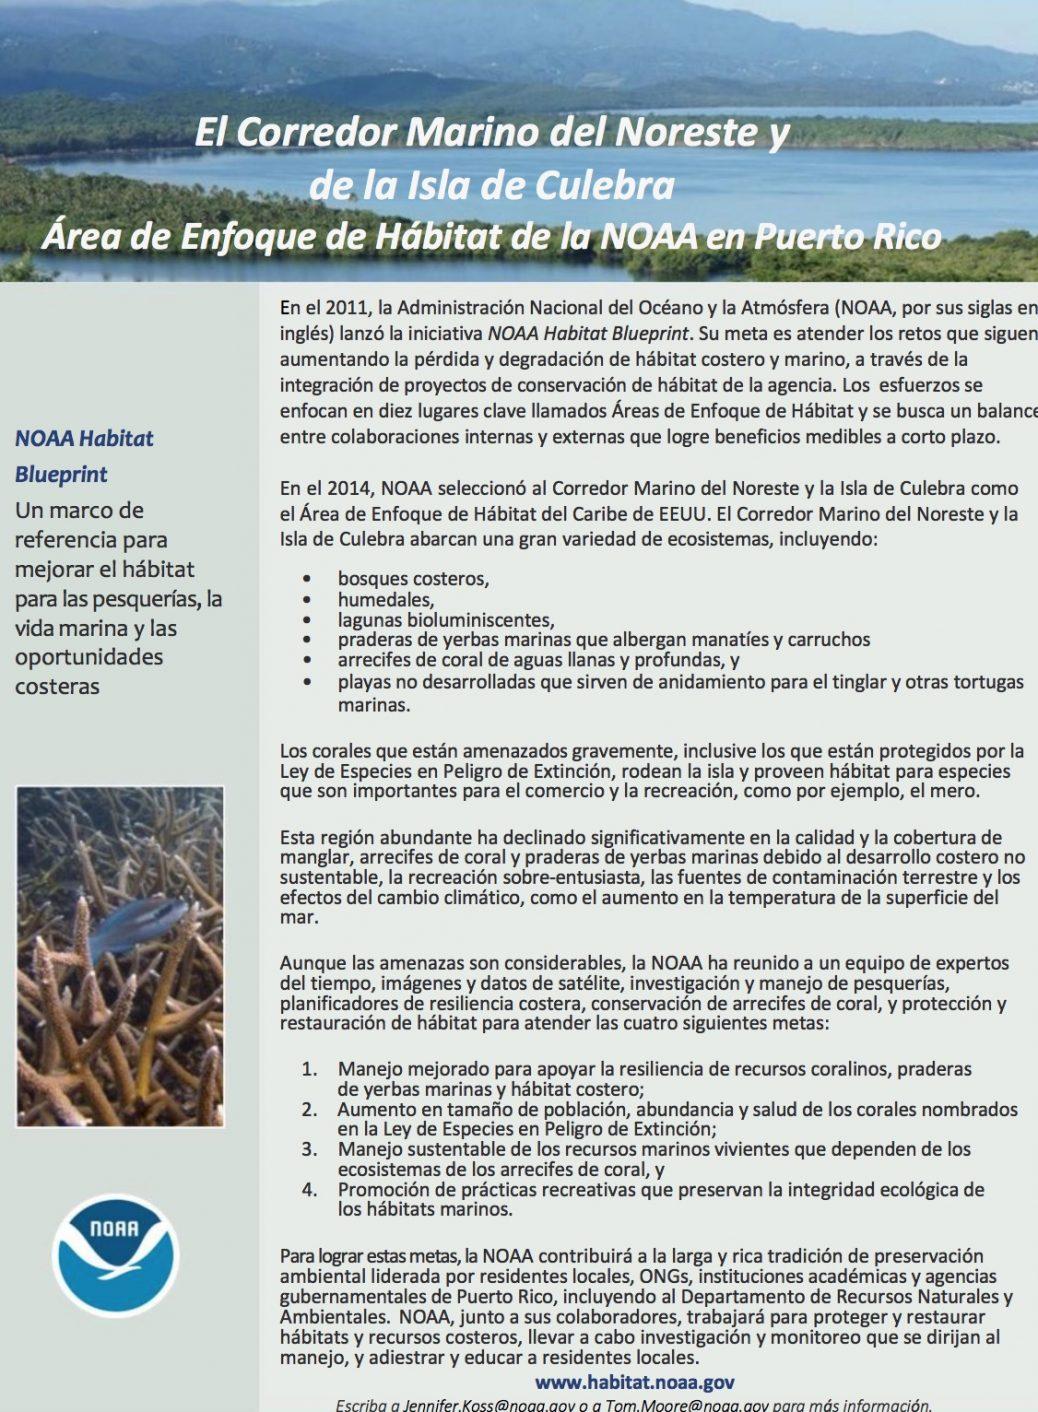 Noaa habitat blueprint puerto rico sea grant college program noaa habitat blueprint malvernweather Image collections